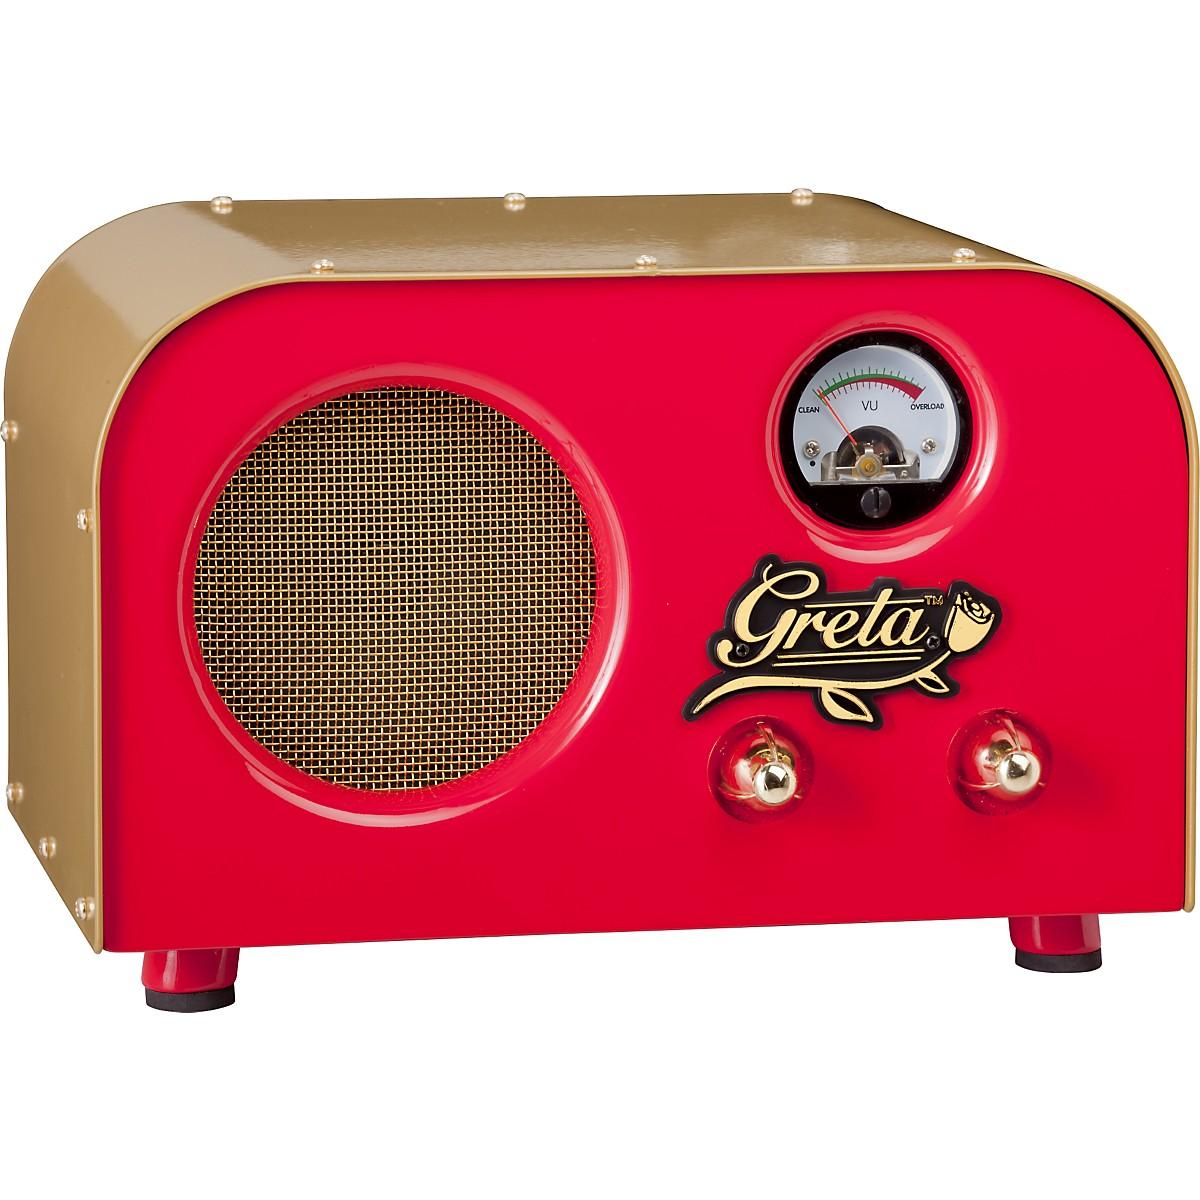 Fender Pawn Shop Special Greta 2W 1x4 Tube Guitar Combo Amp